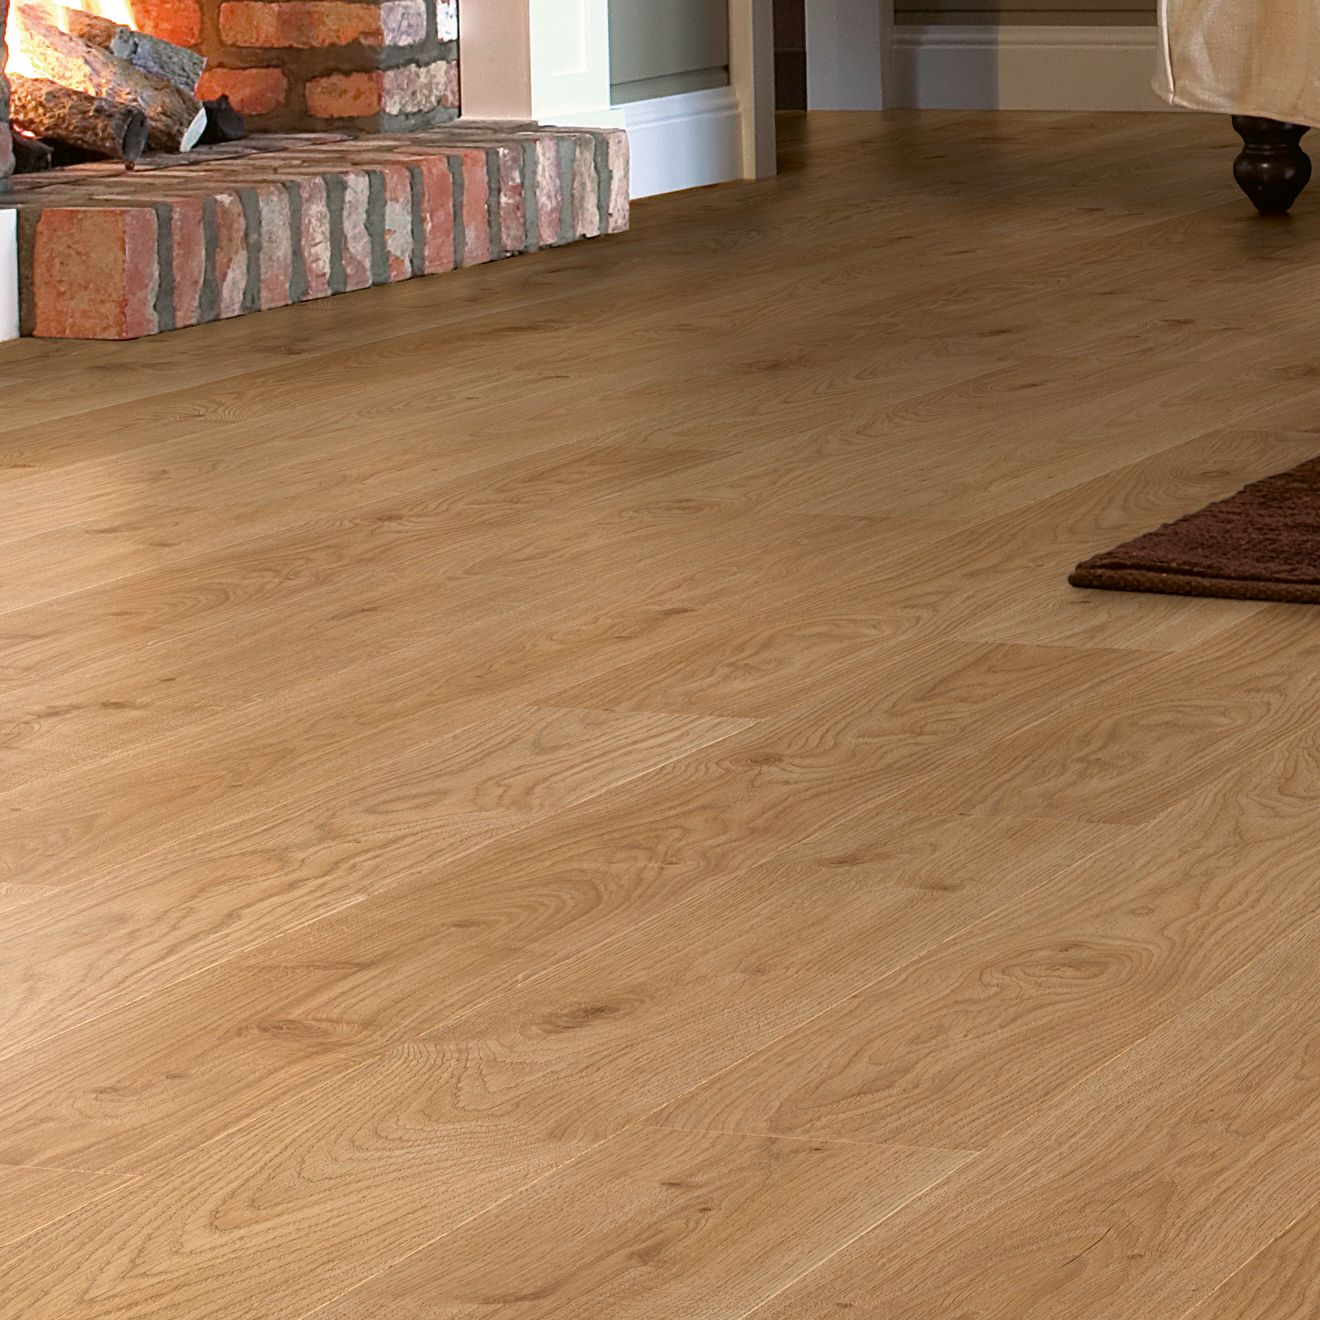 Quickstep Andante Natural White Oak, Quickstep Andante Oak Effect Laminate Flooring